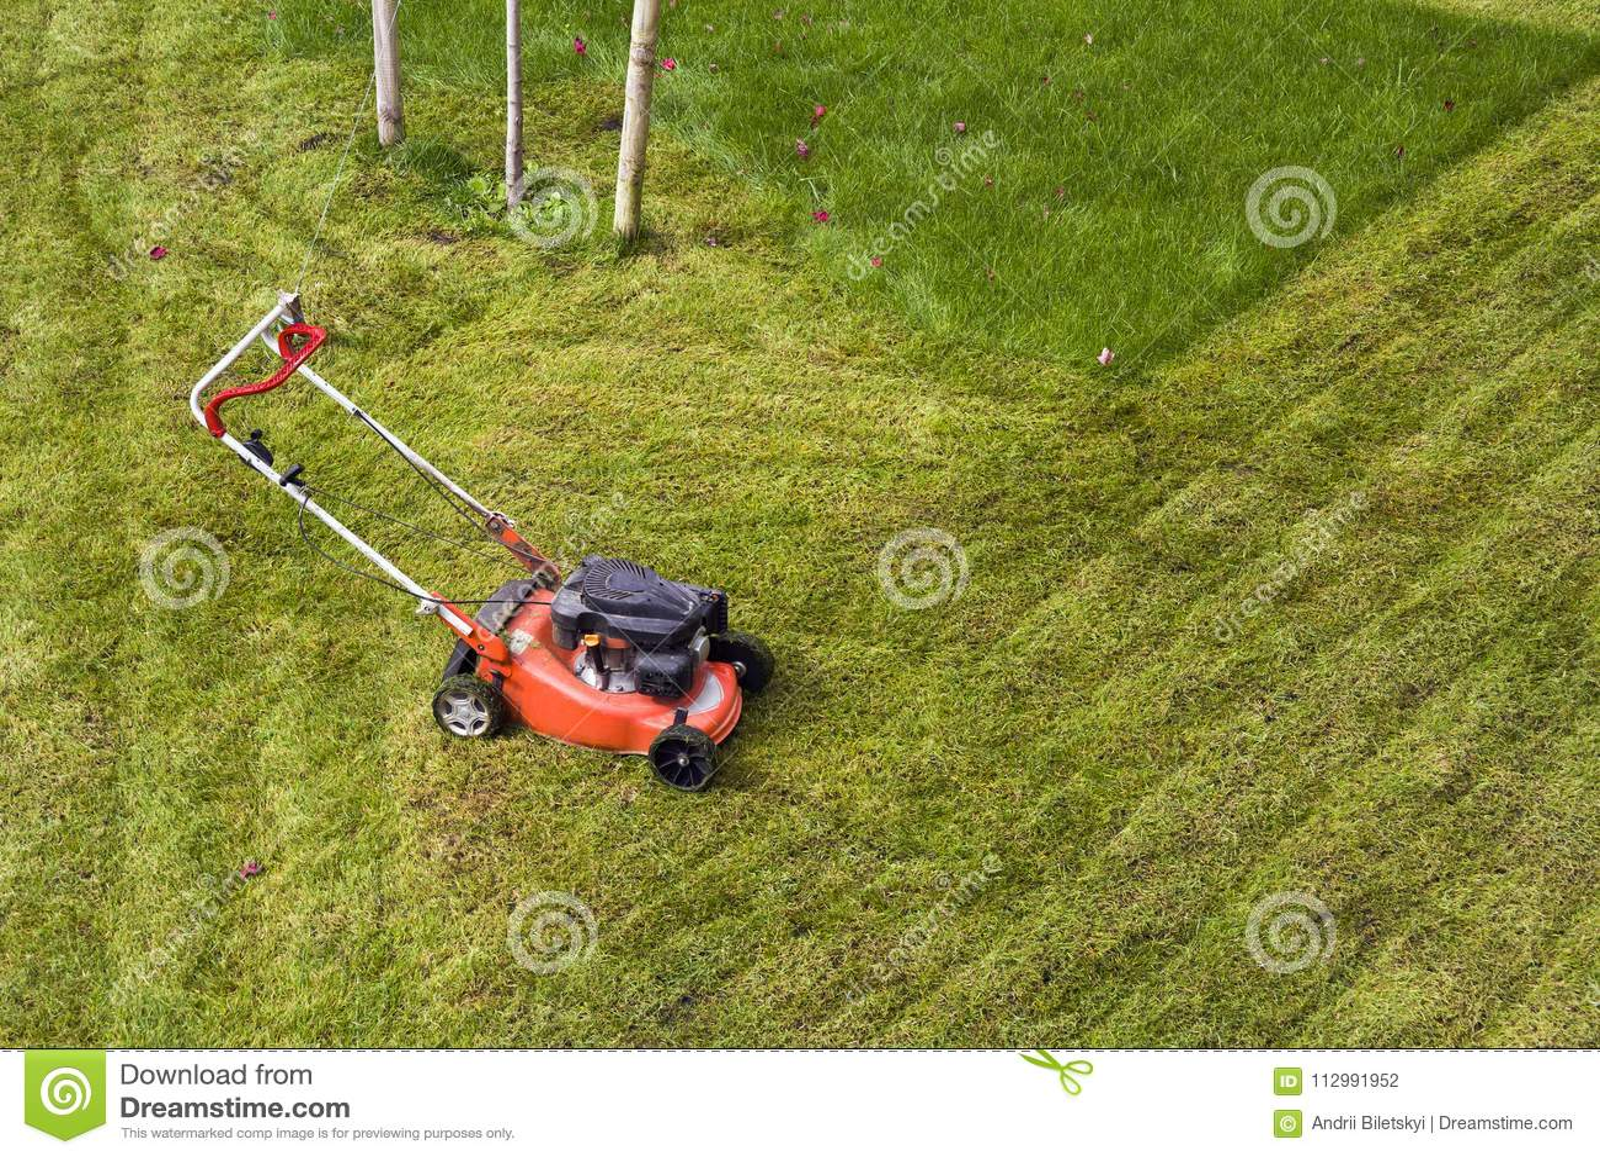 Lawn mower cutting grass on green field in yard. Mowing gardener care work tool